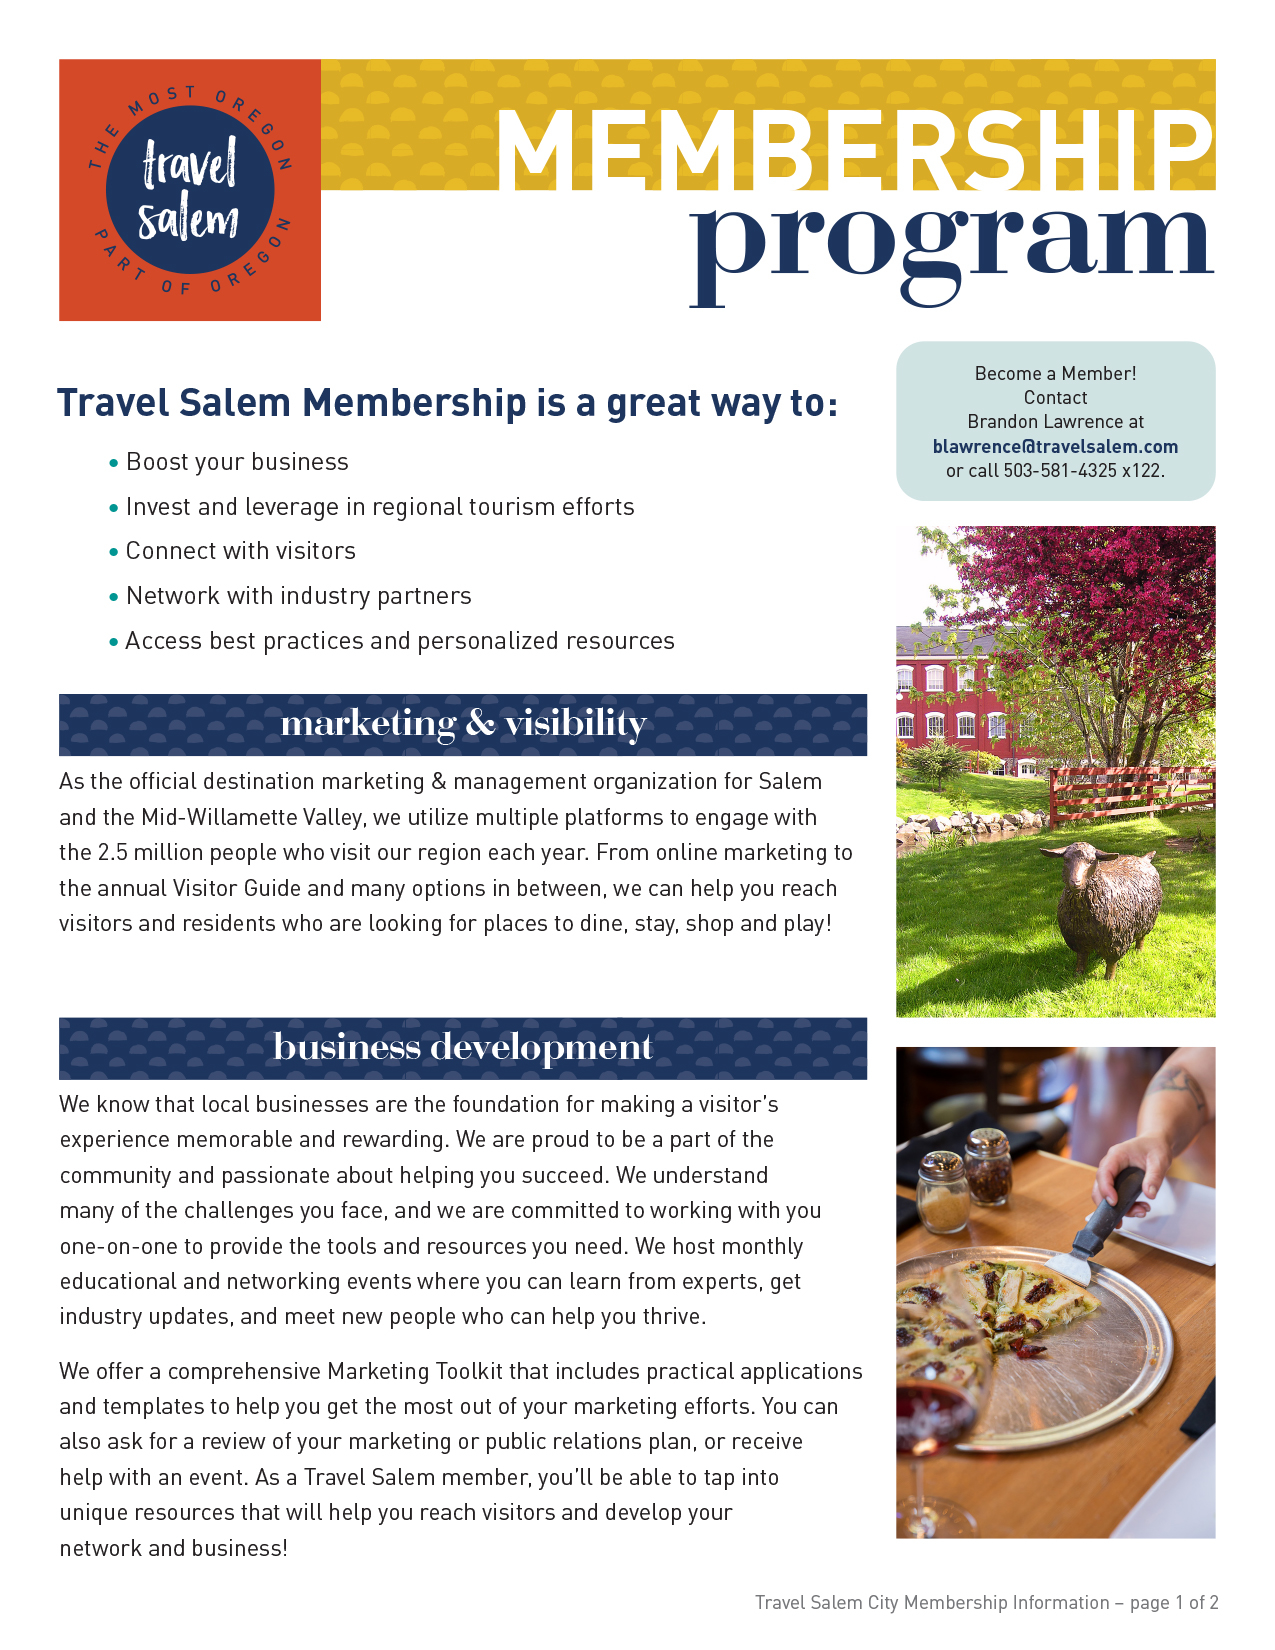 Travel Salem City Membership Information Flyer